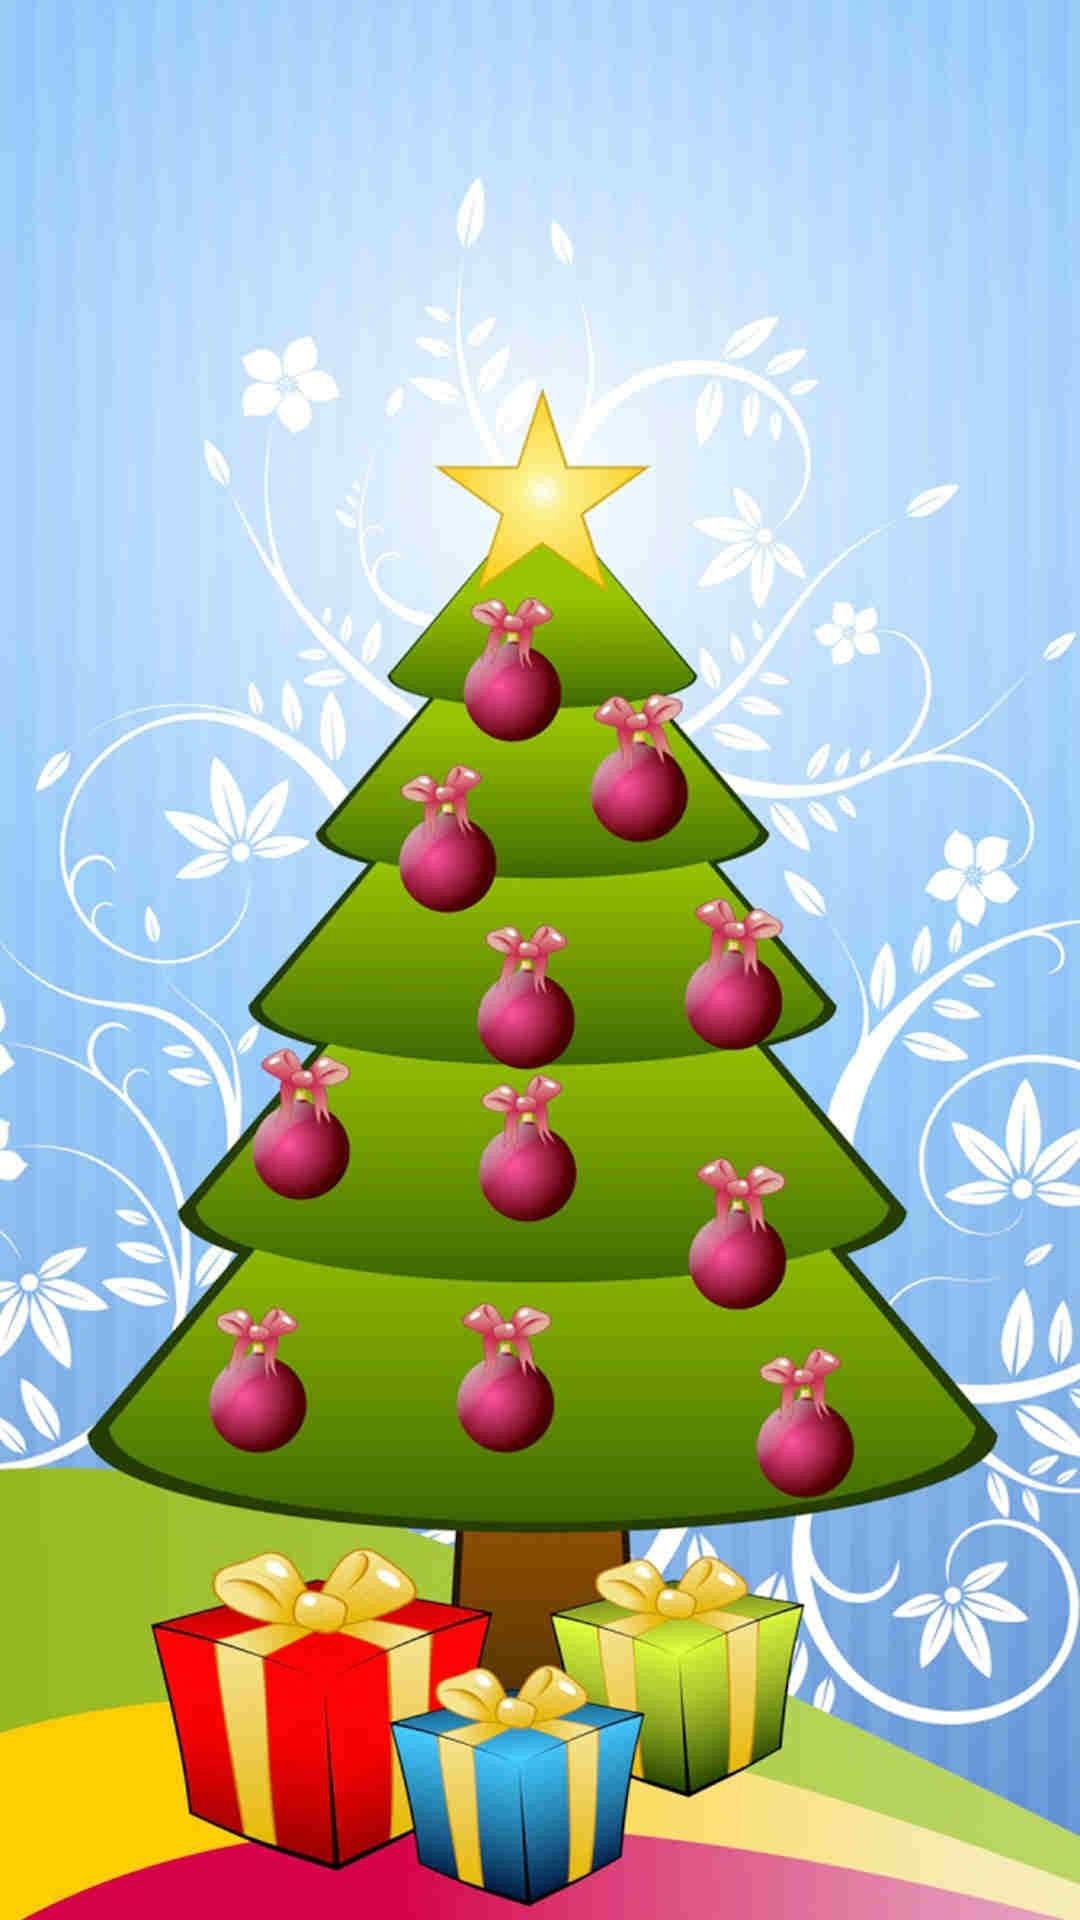 Cute Christmas Iphone Wallpaper